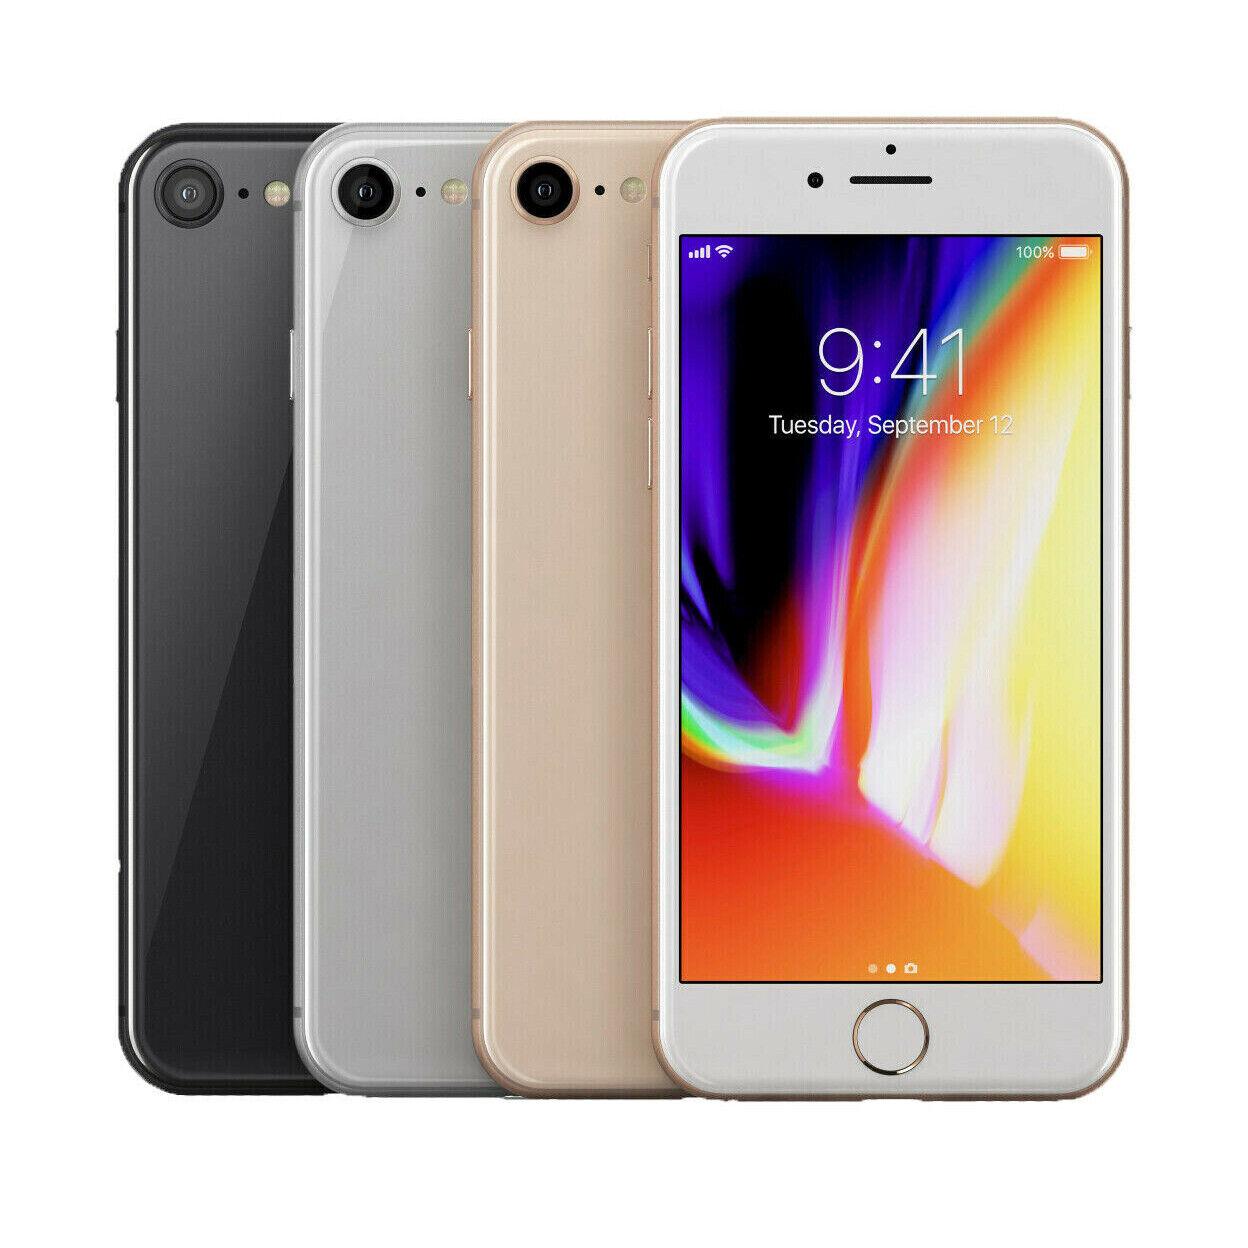 Apple iPhone 8 64GB (Factory Unlocked) Smartphone SR + 3 Month Free Service Plan 1